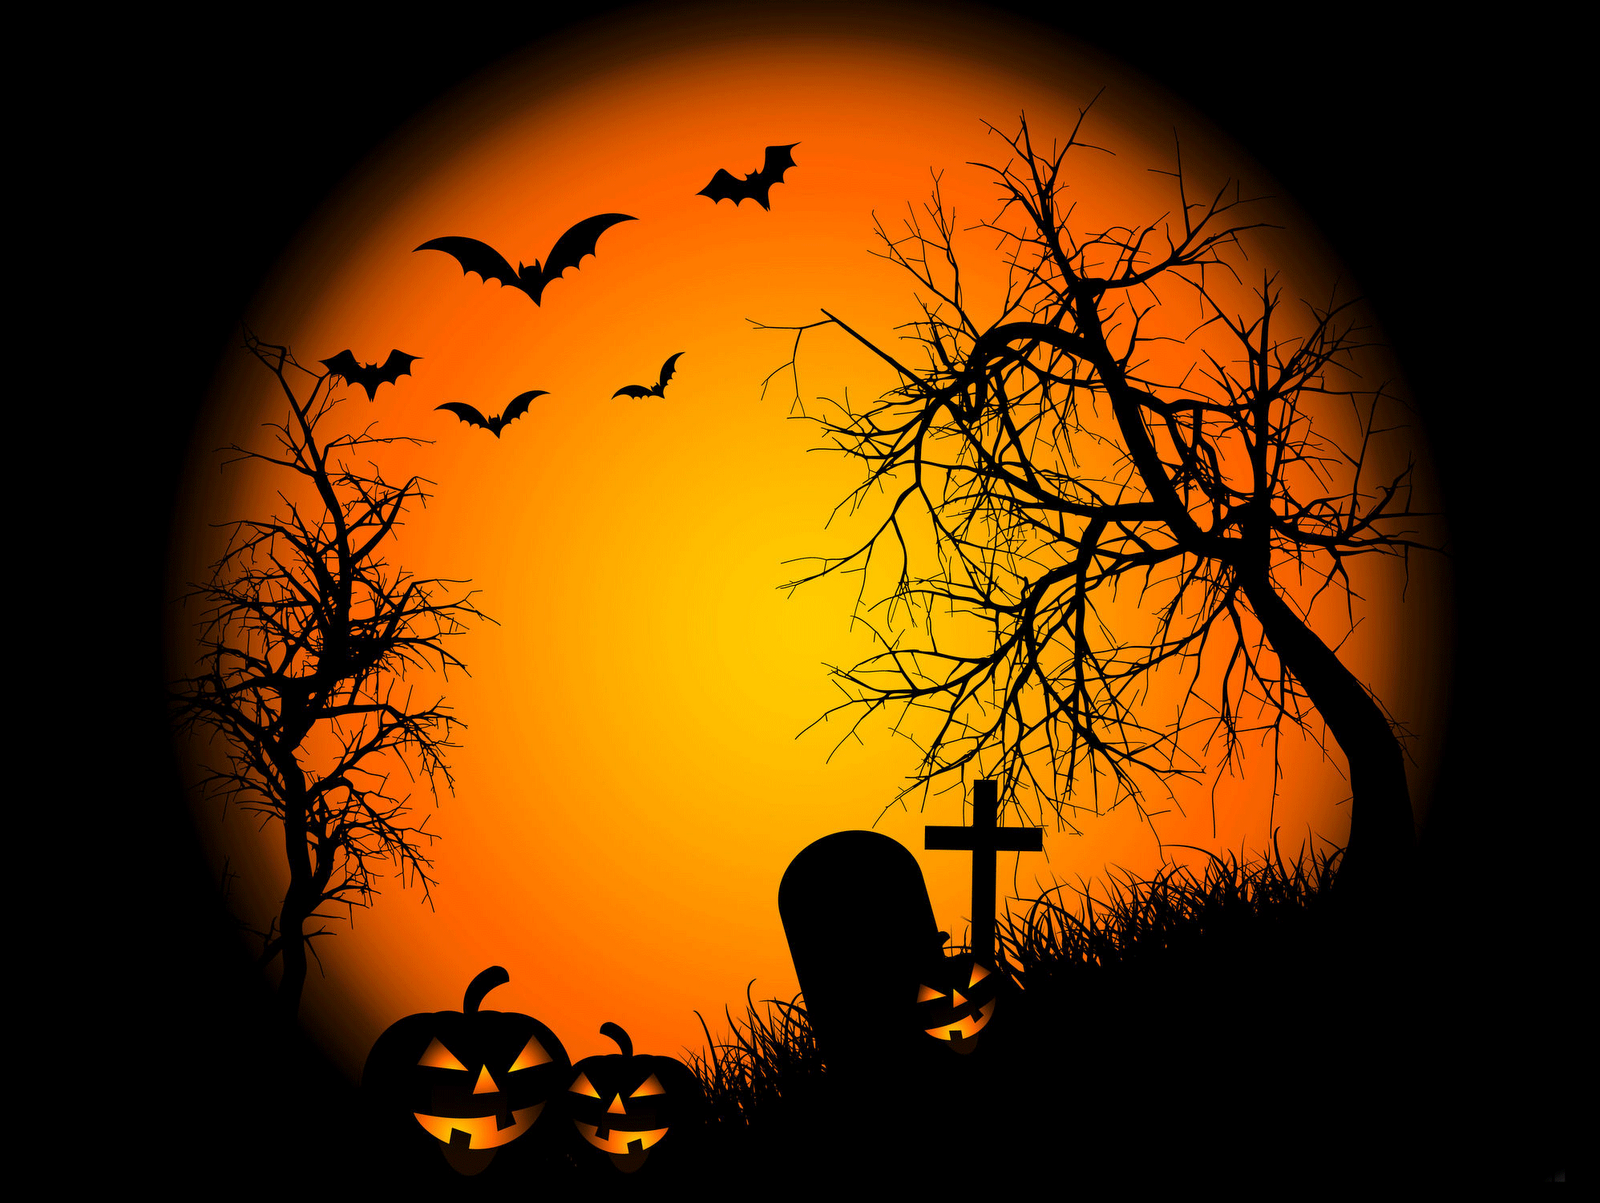 Beautiful Wallpaper Halloween Pinterest - de2ec7a42875225c7ed4592e45599f78  Collection_93628.png